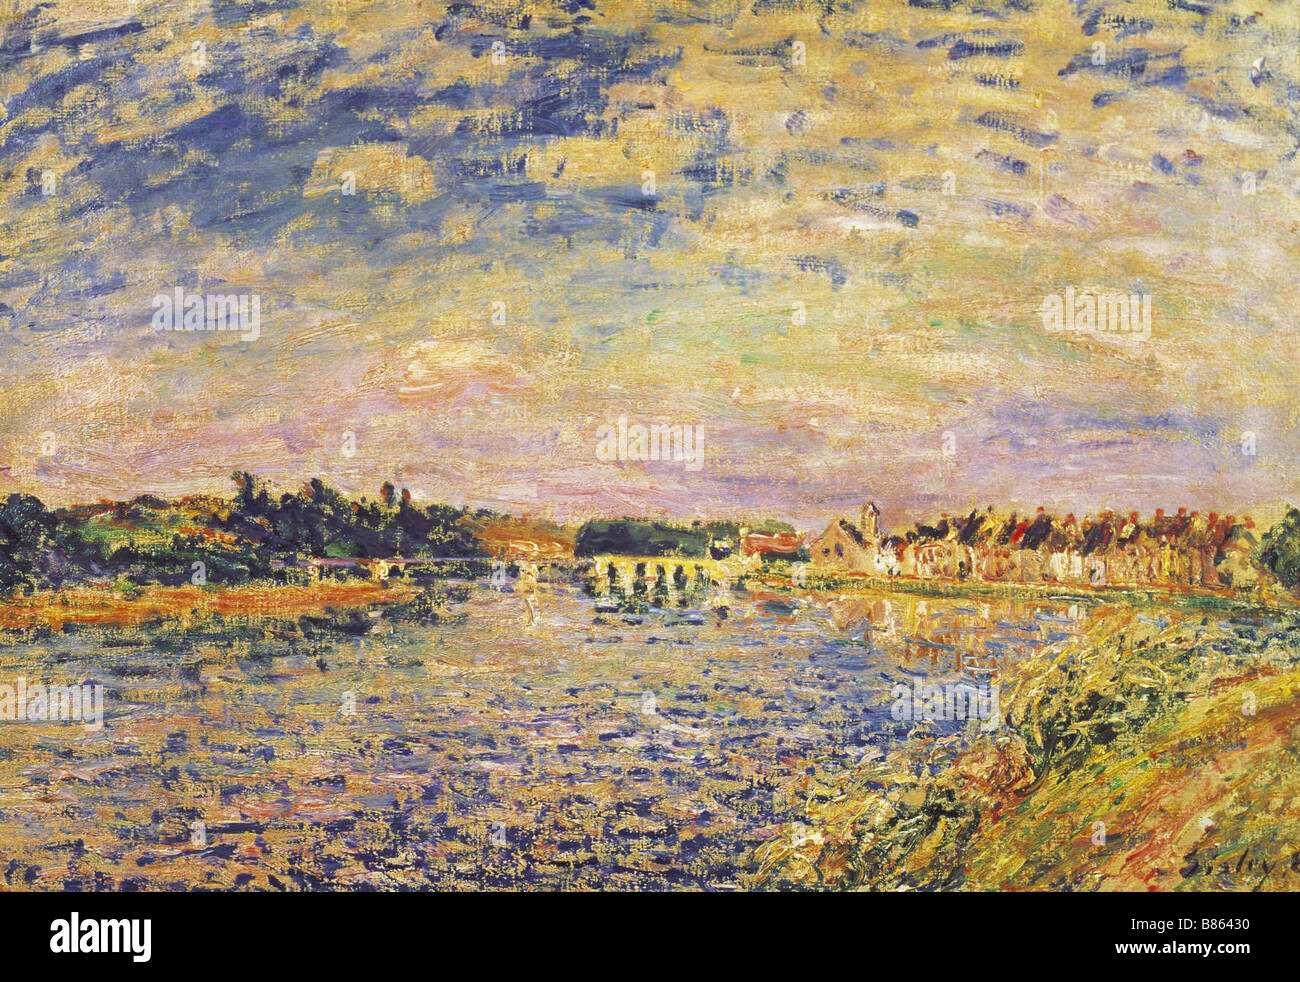 Sisley, The River Seine - Stock Image